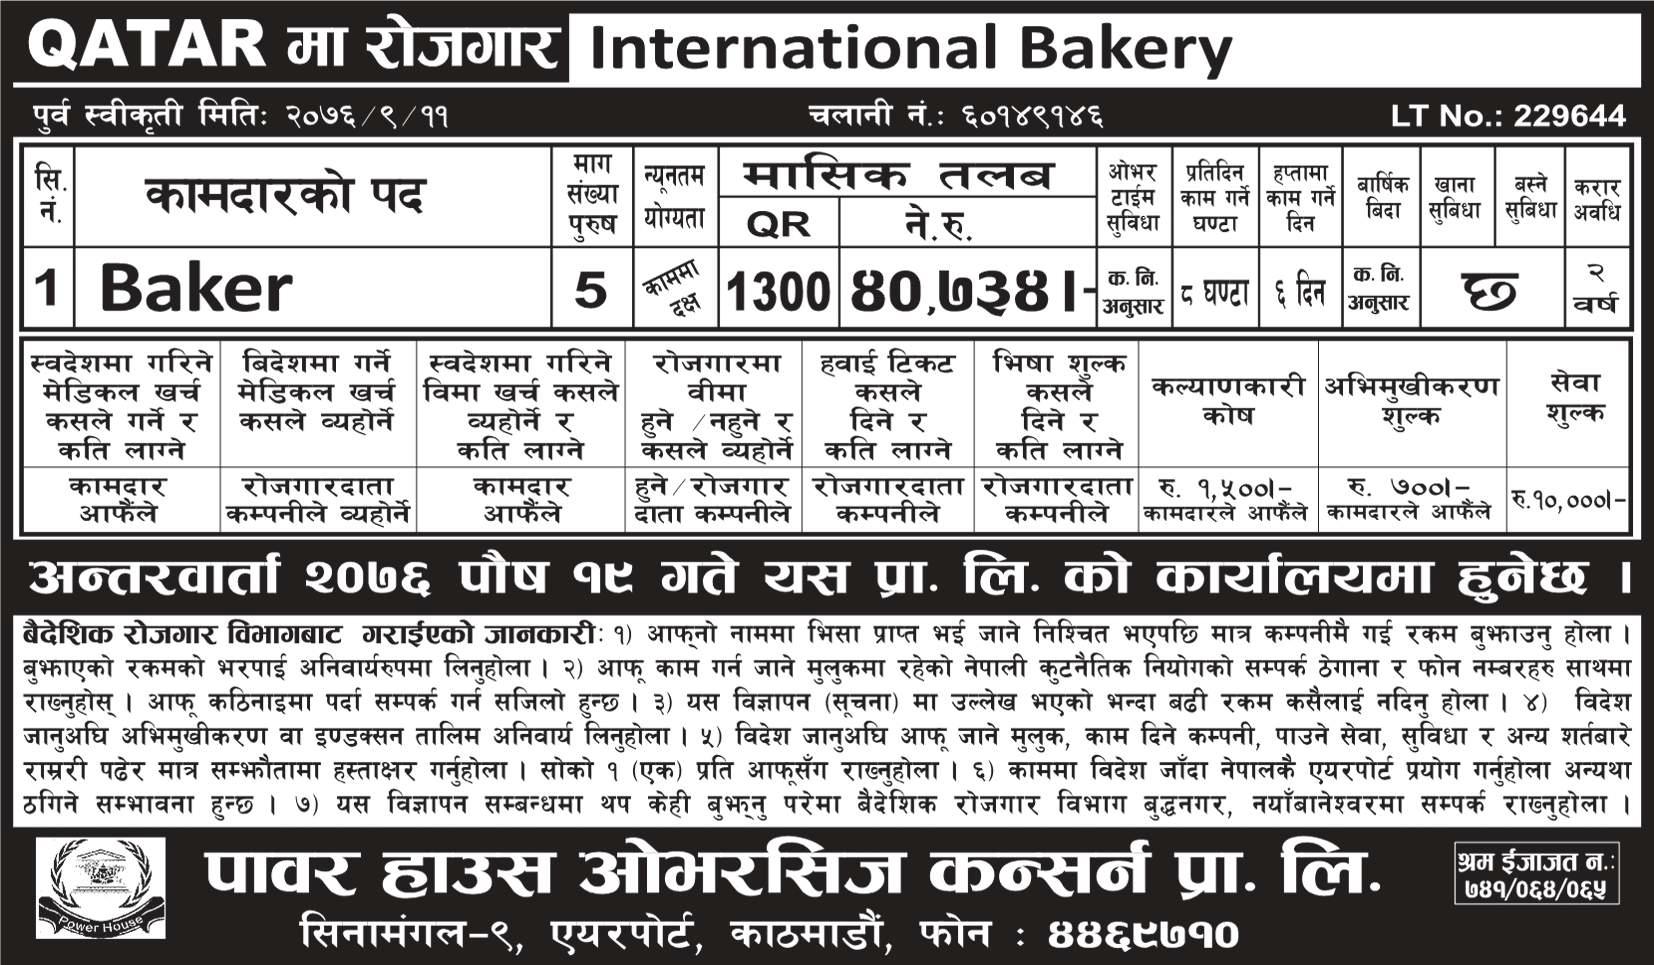 Job For Baker at Qatar